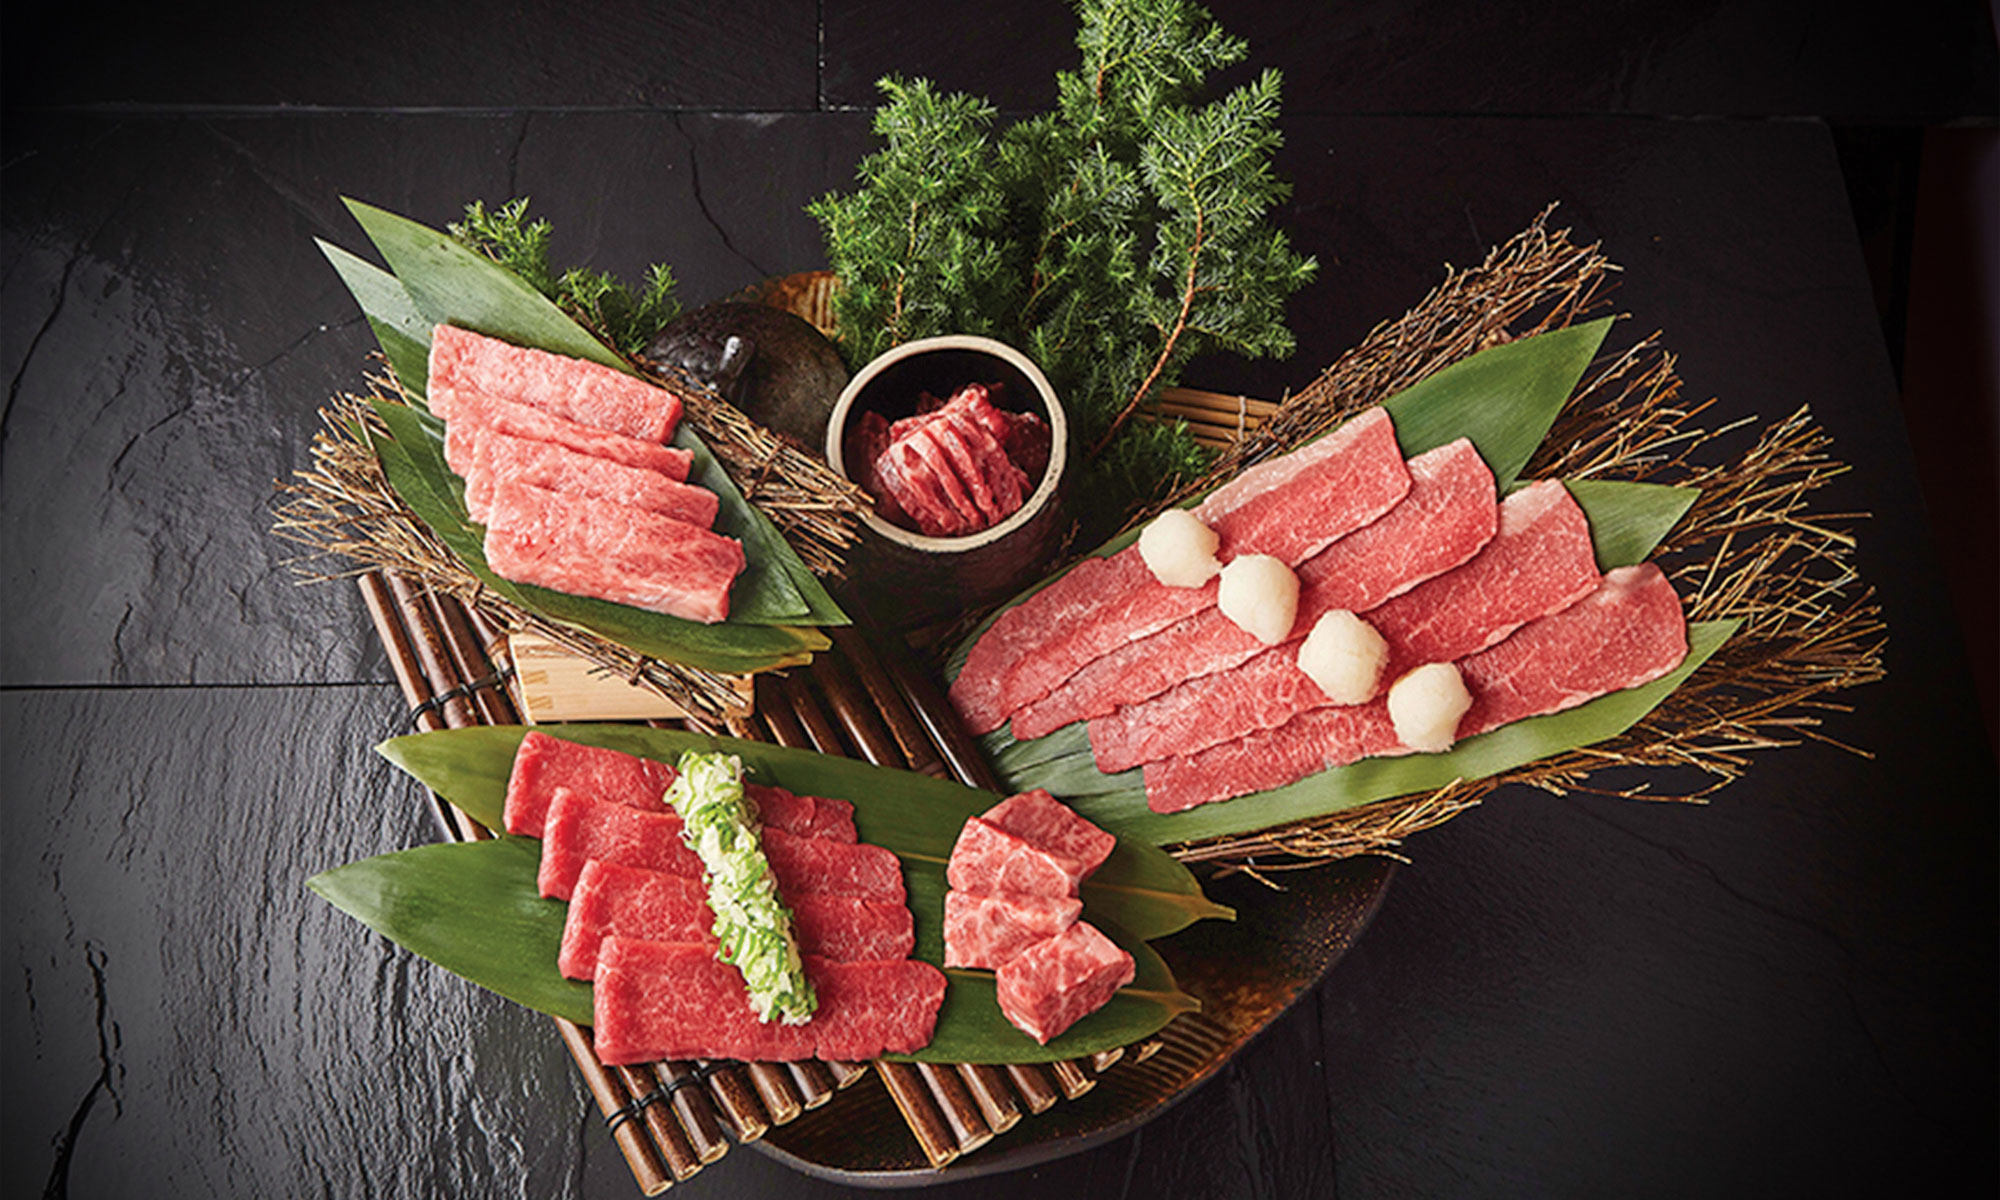 kanpai-classics-sher-wagyu-yakaniku-beef-platter2